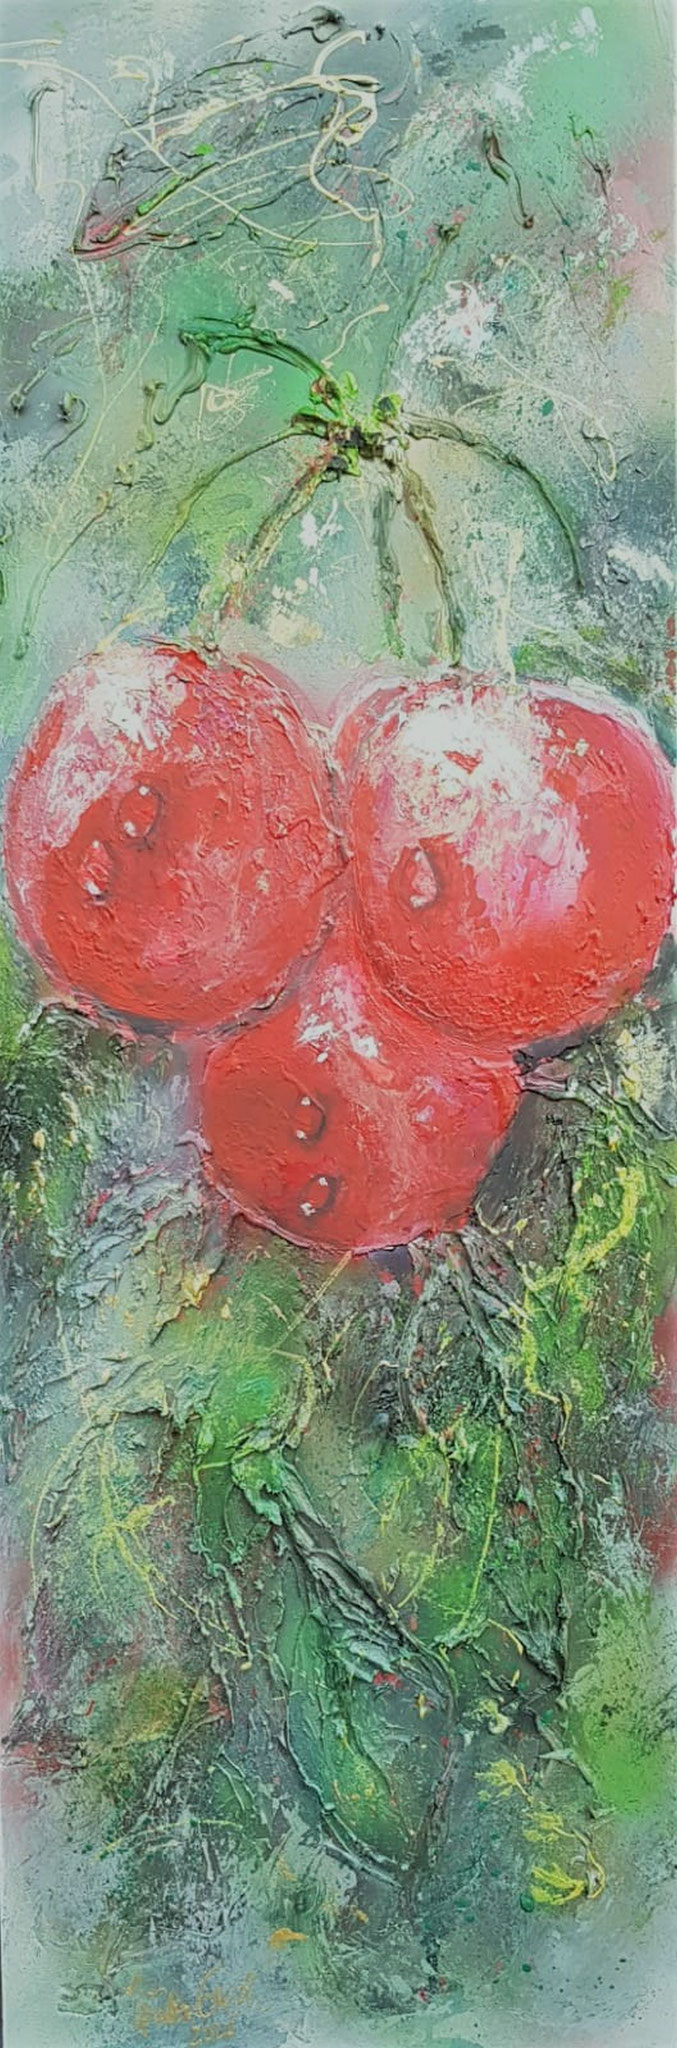 Cherry-dream in 2020 (Canvas 40 X 1,20 X 1,5 cm) Acryl/Mixed Media